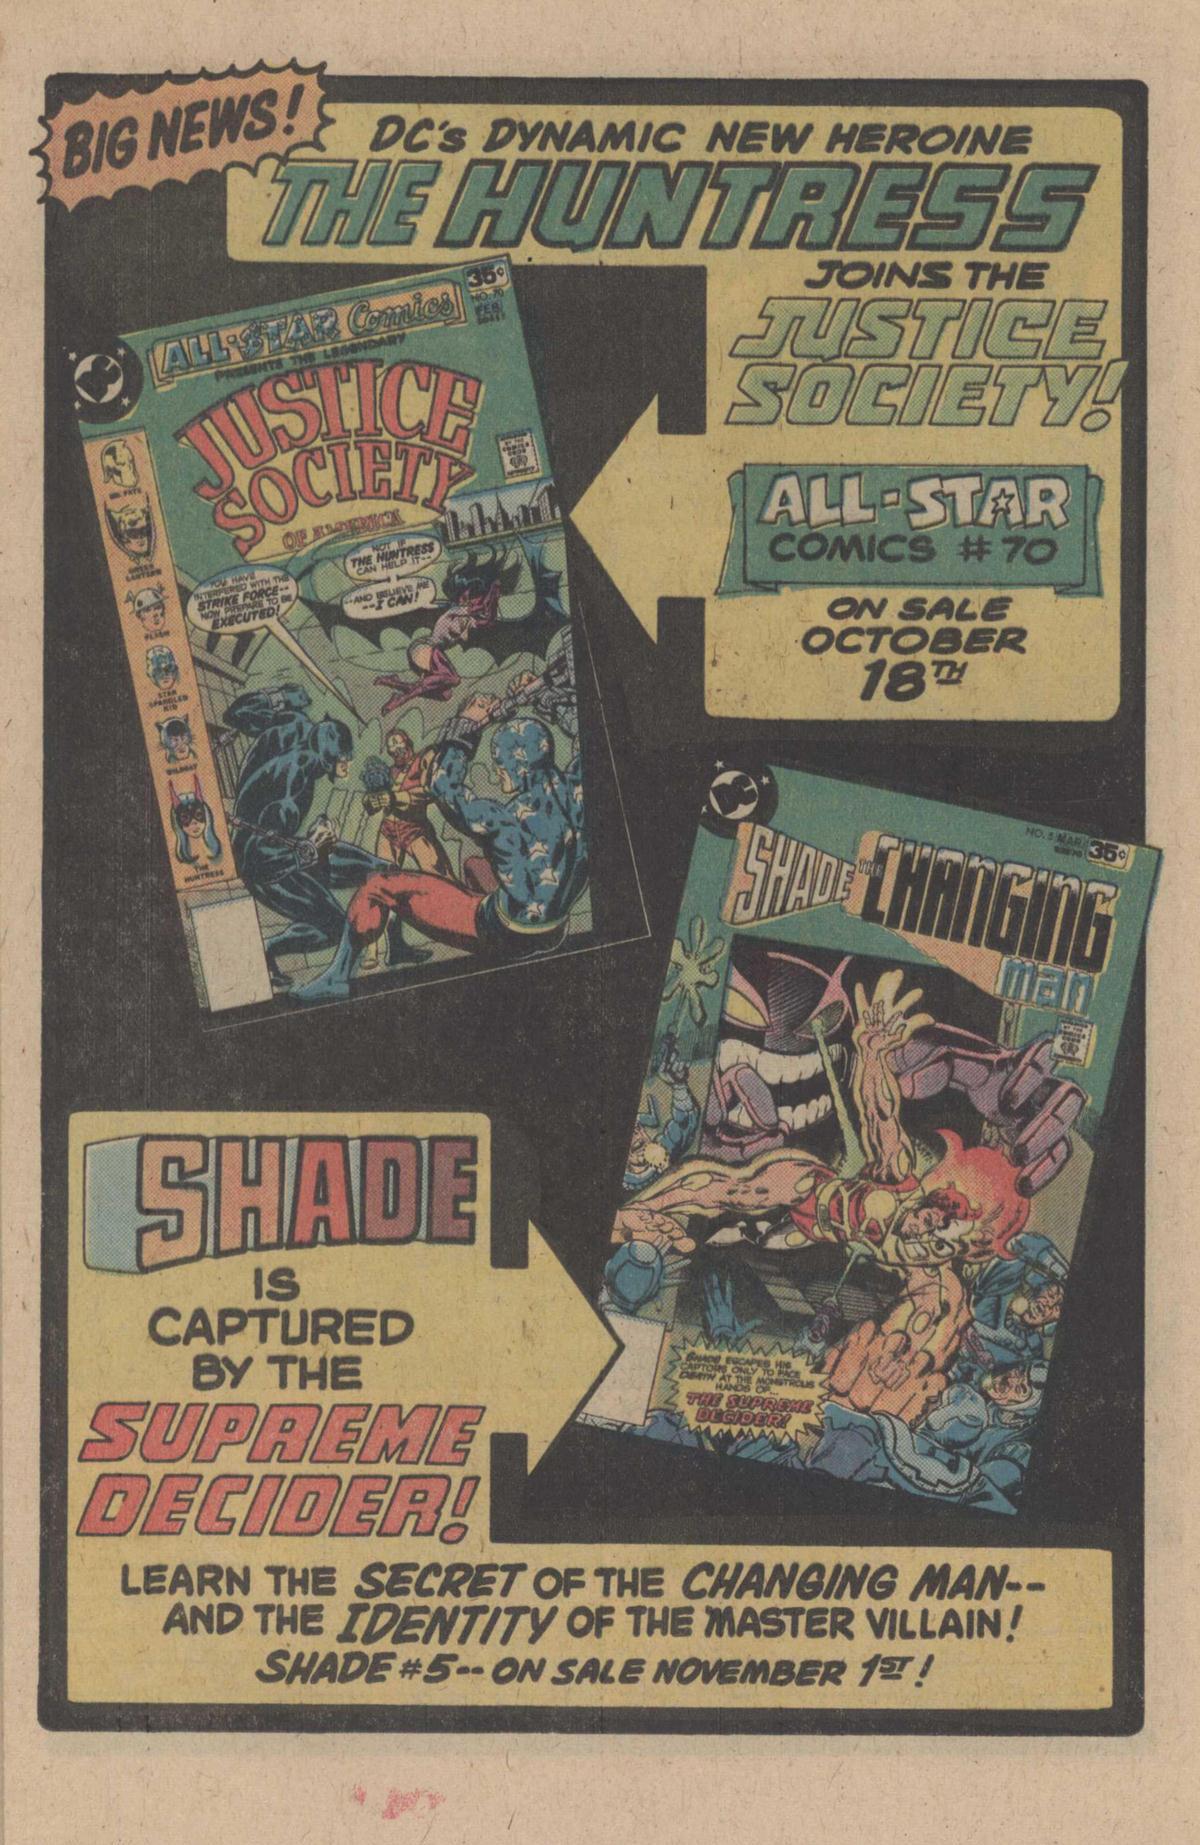 Read online All-Star Comics comic -  Issue #70 - 24